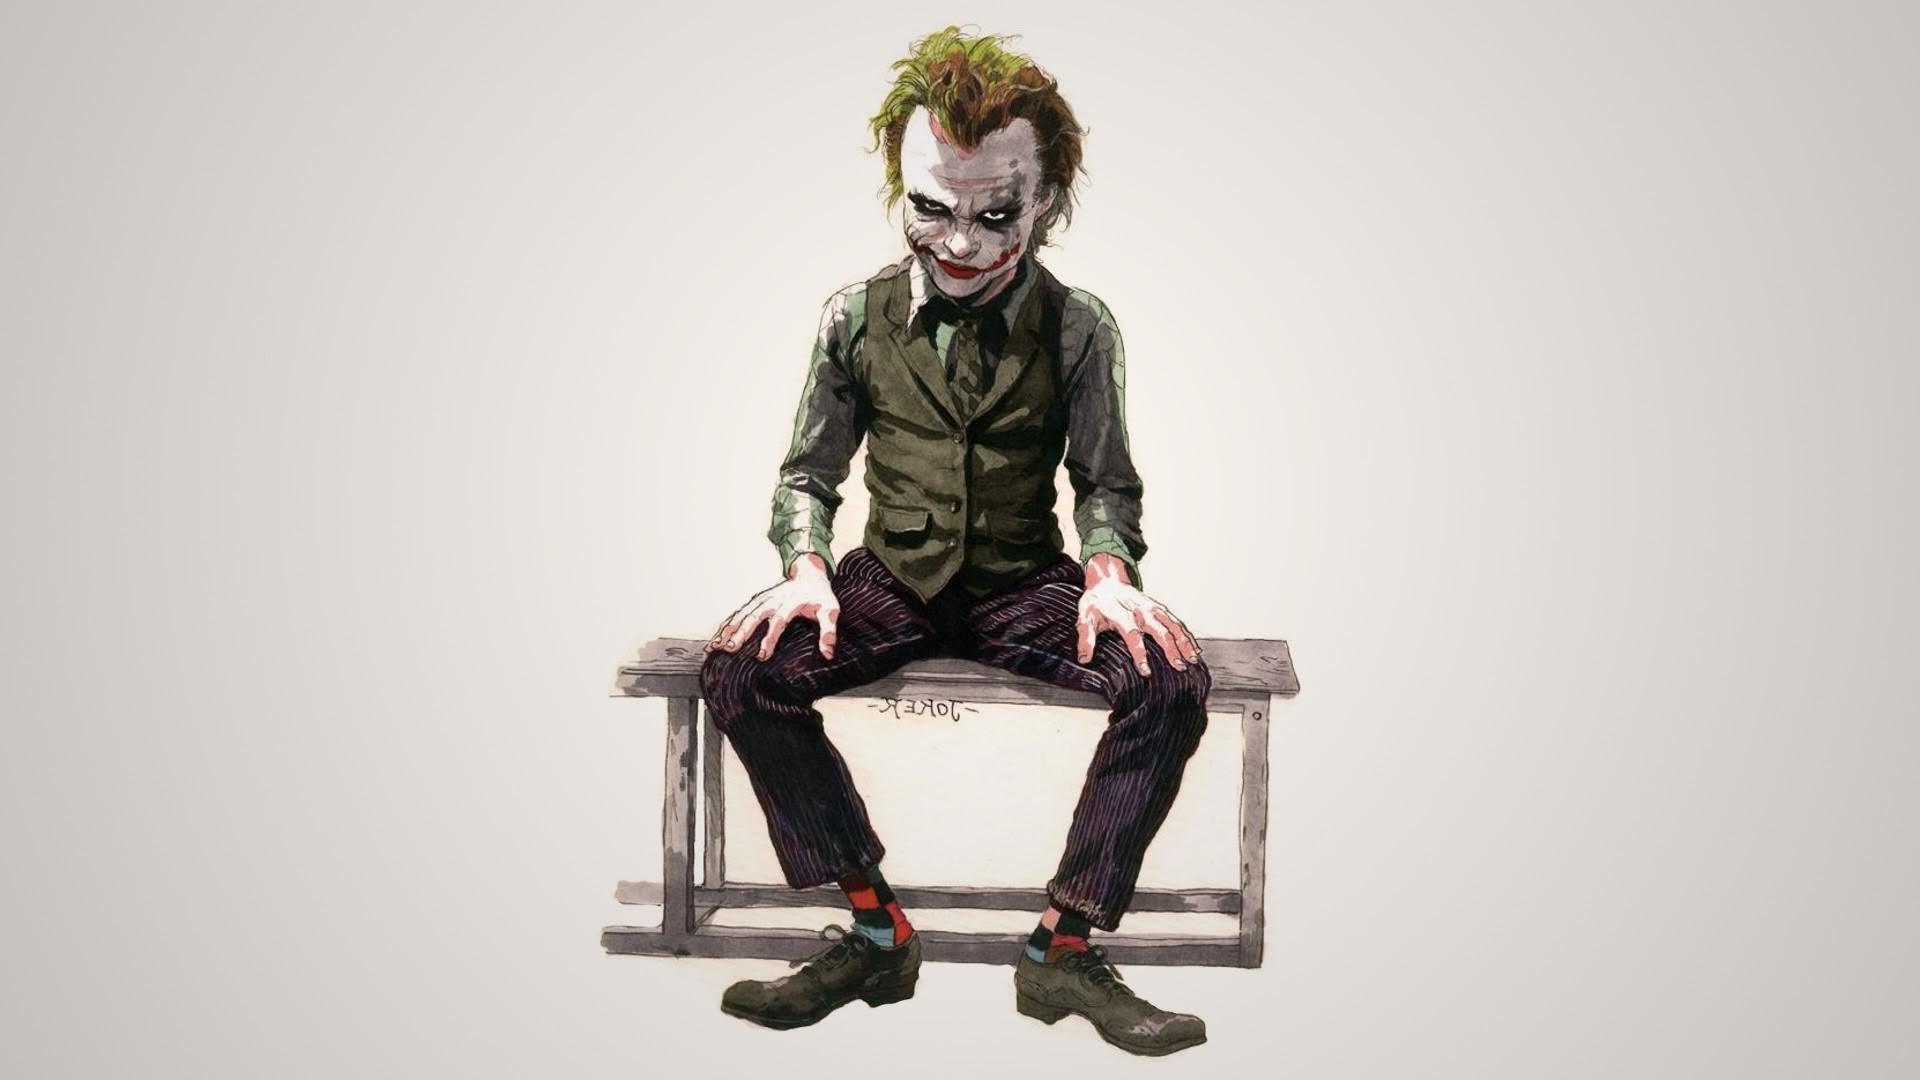 1920x1080 Px Batman Heath Ledger Joker The Dark Knight Rises